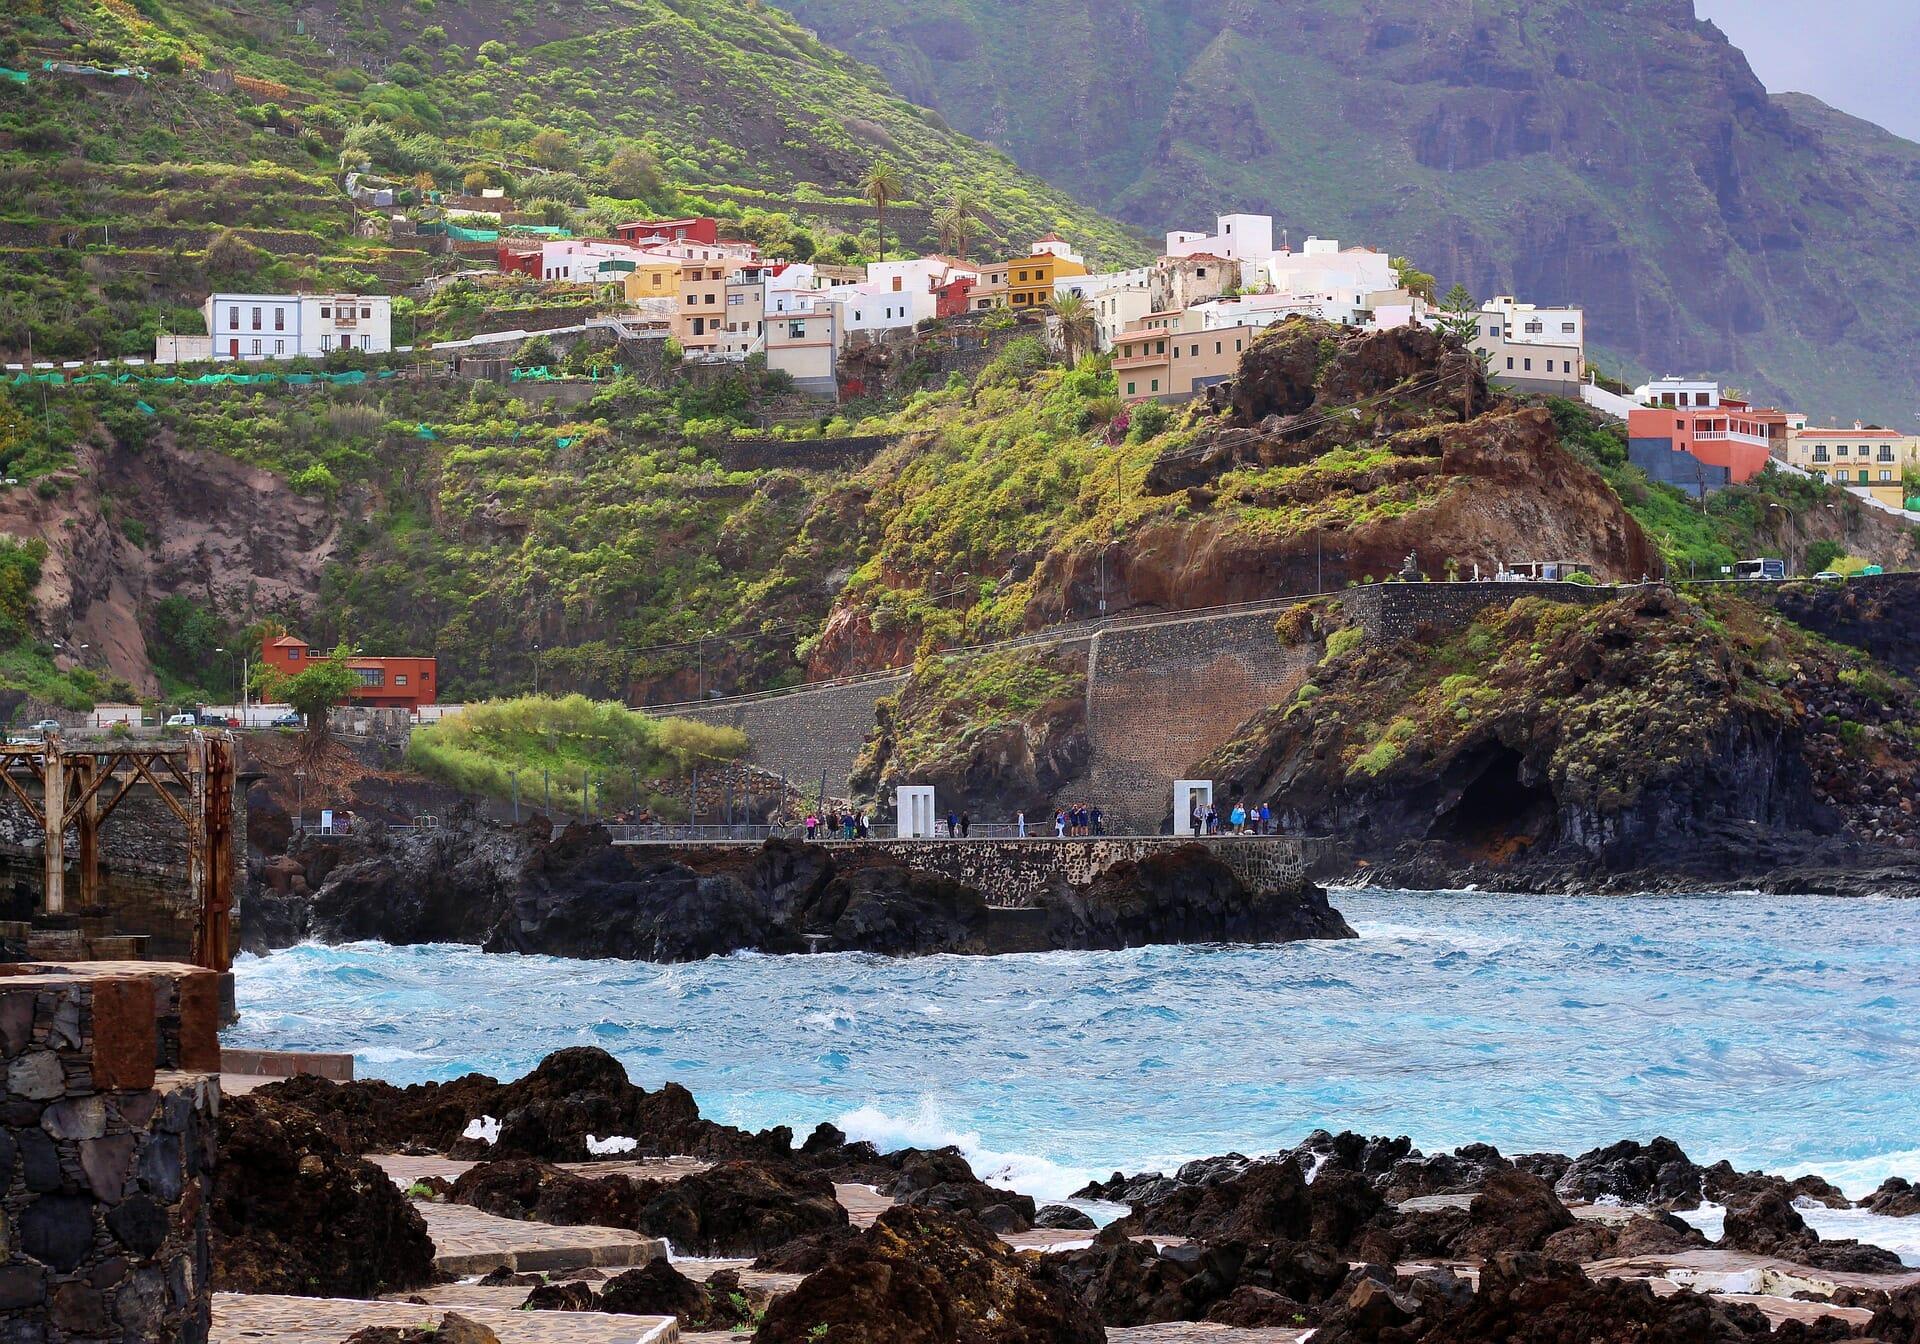 Iles canaries, Tenerife